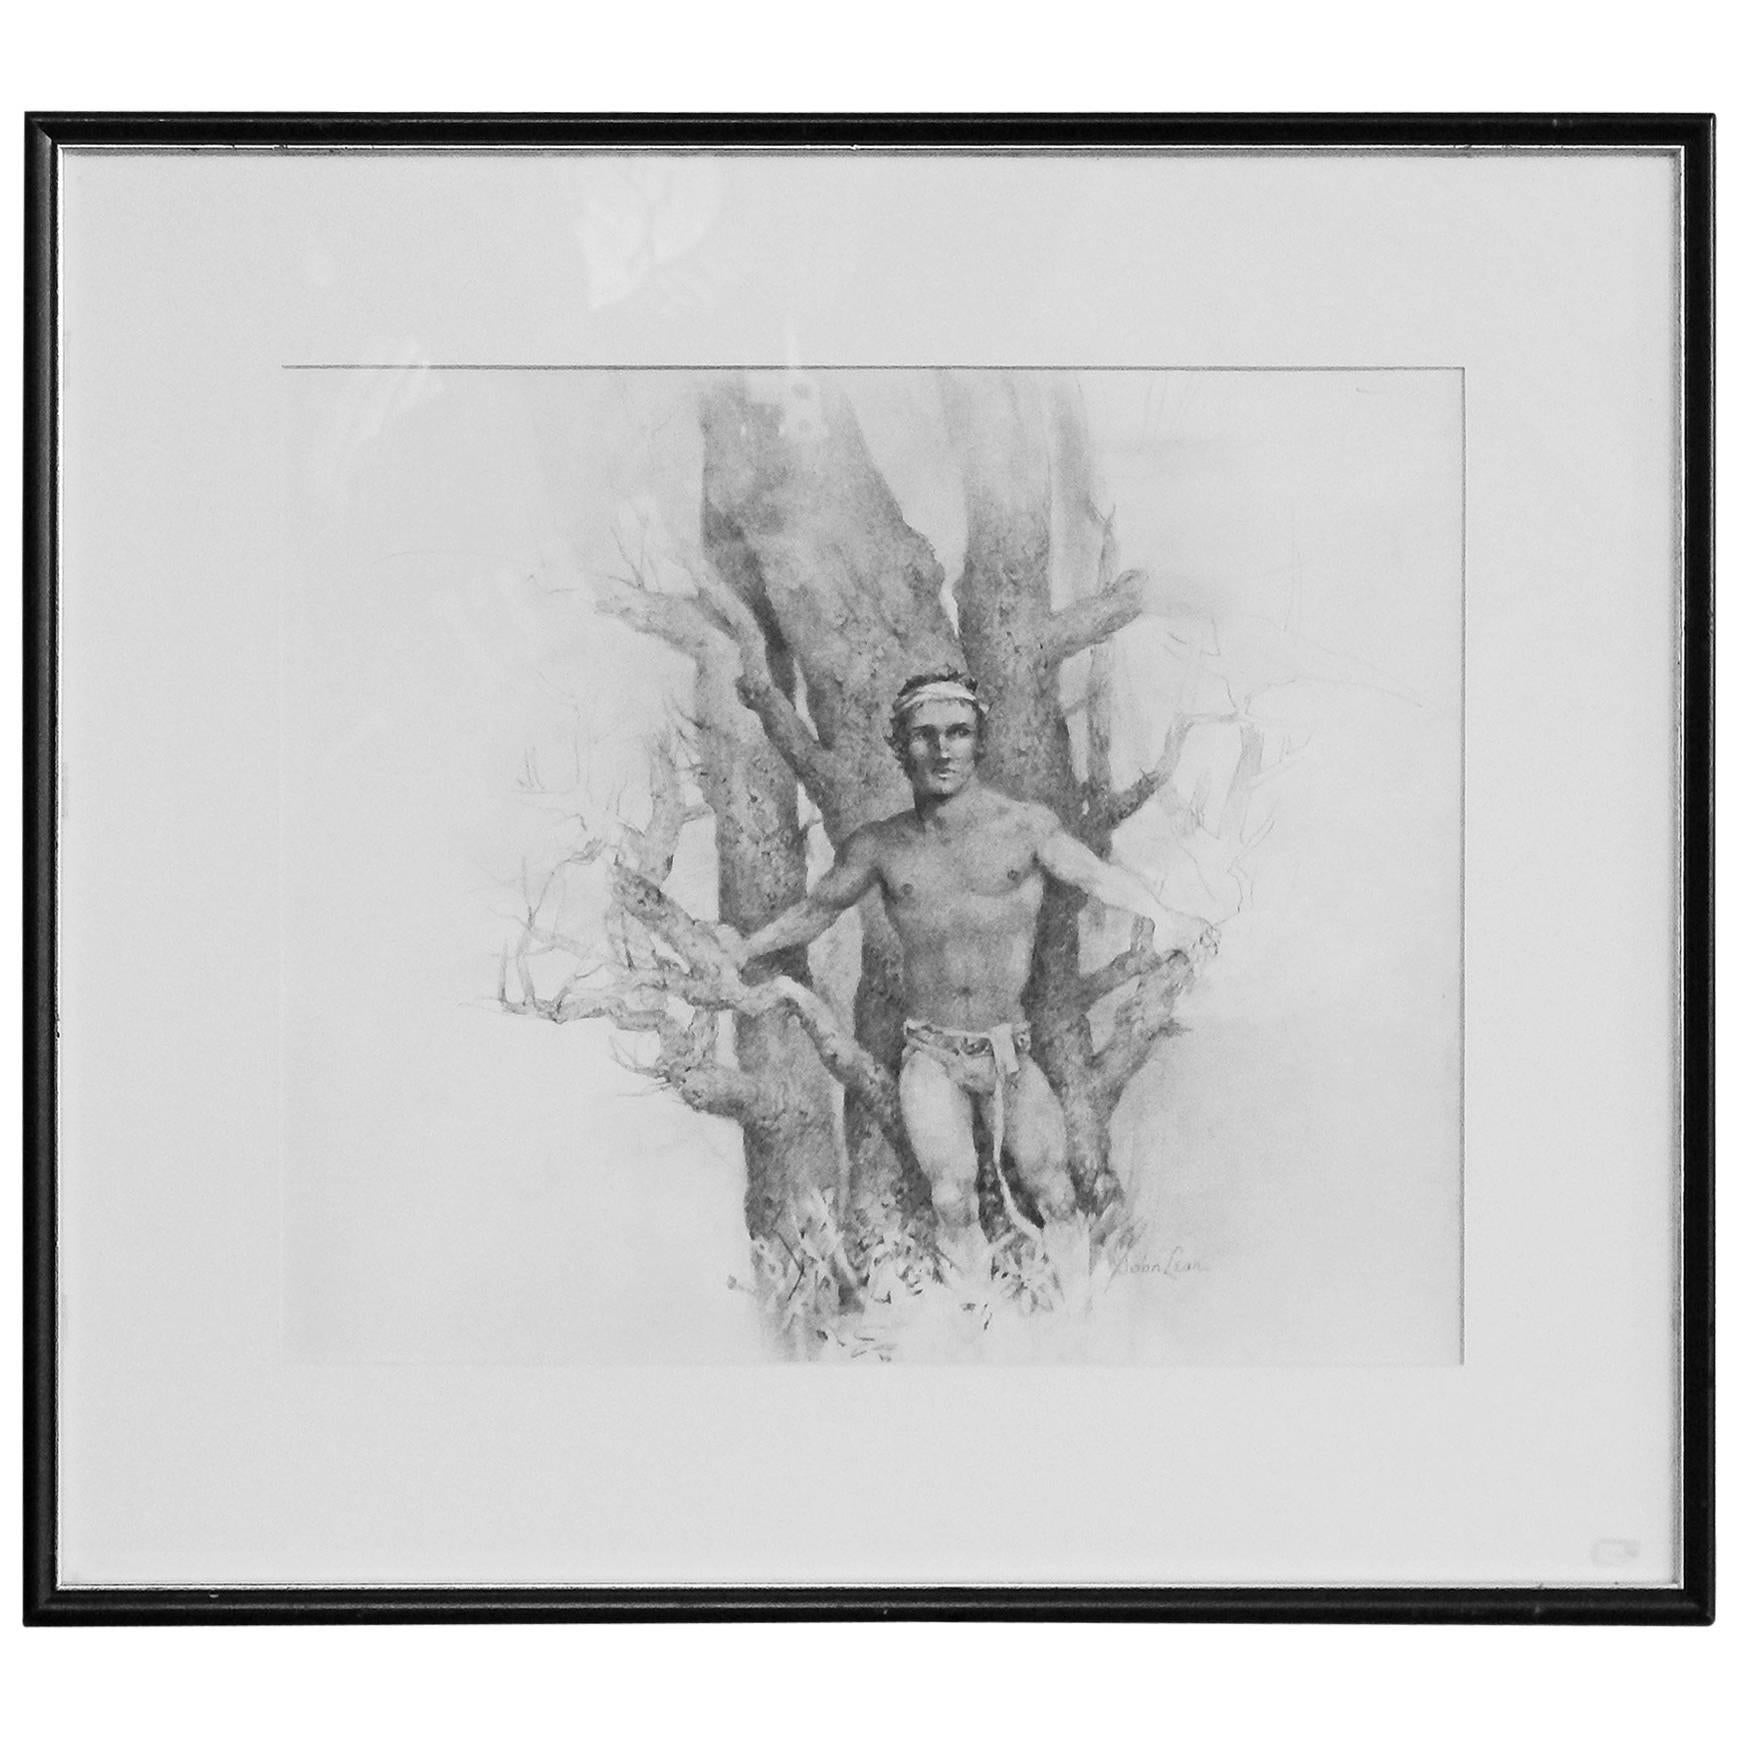 """Semi-Nude Man with Beech Tree,"" Pencil Drawing by John Lear"